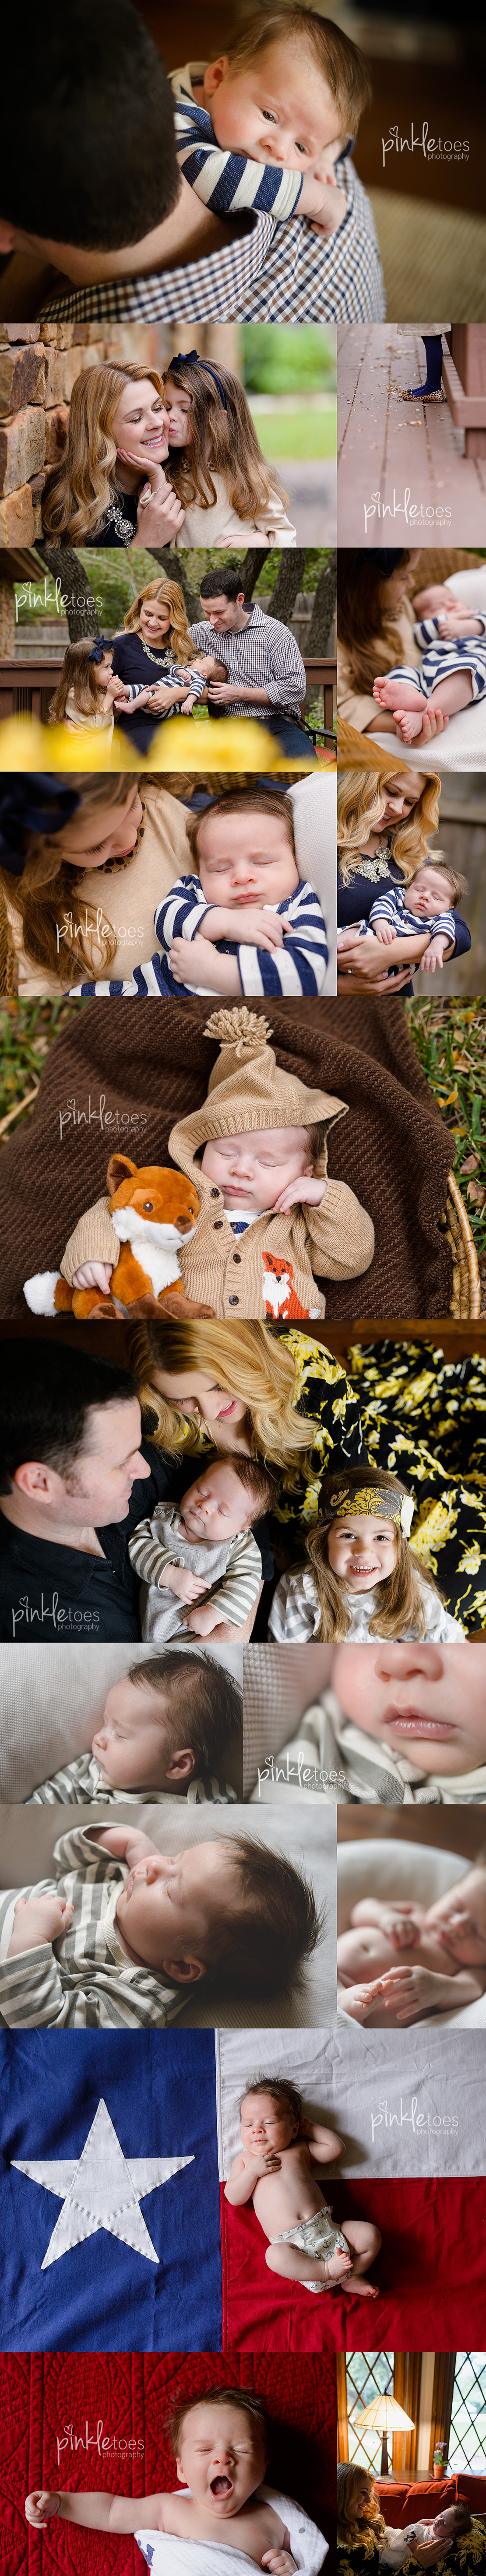 austin-newborn-baby-photography-texas-flag-boy-lifestyle